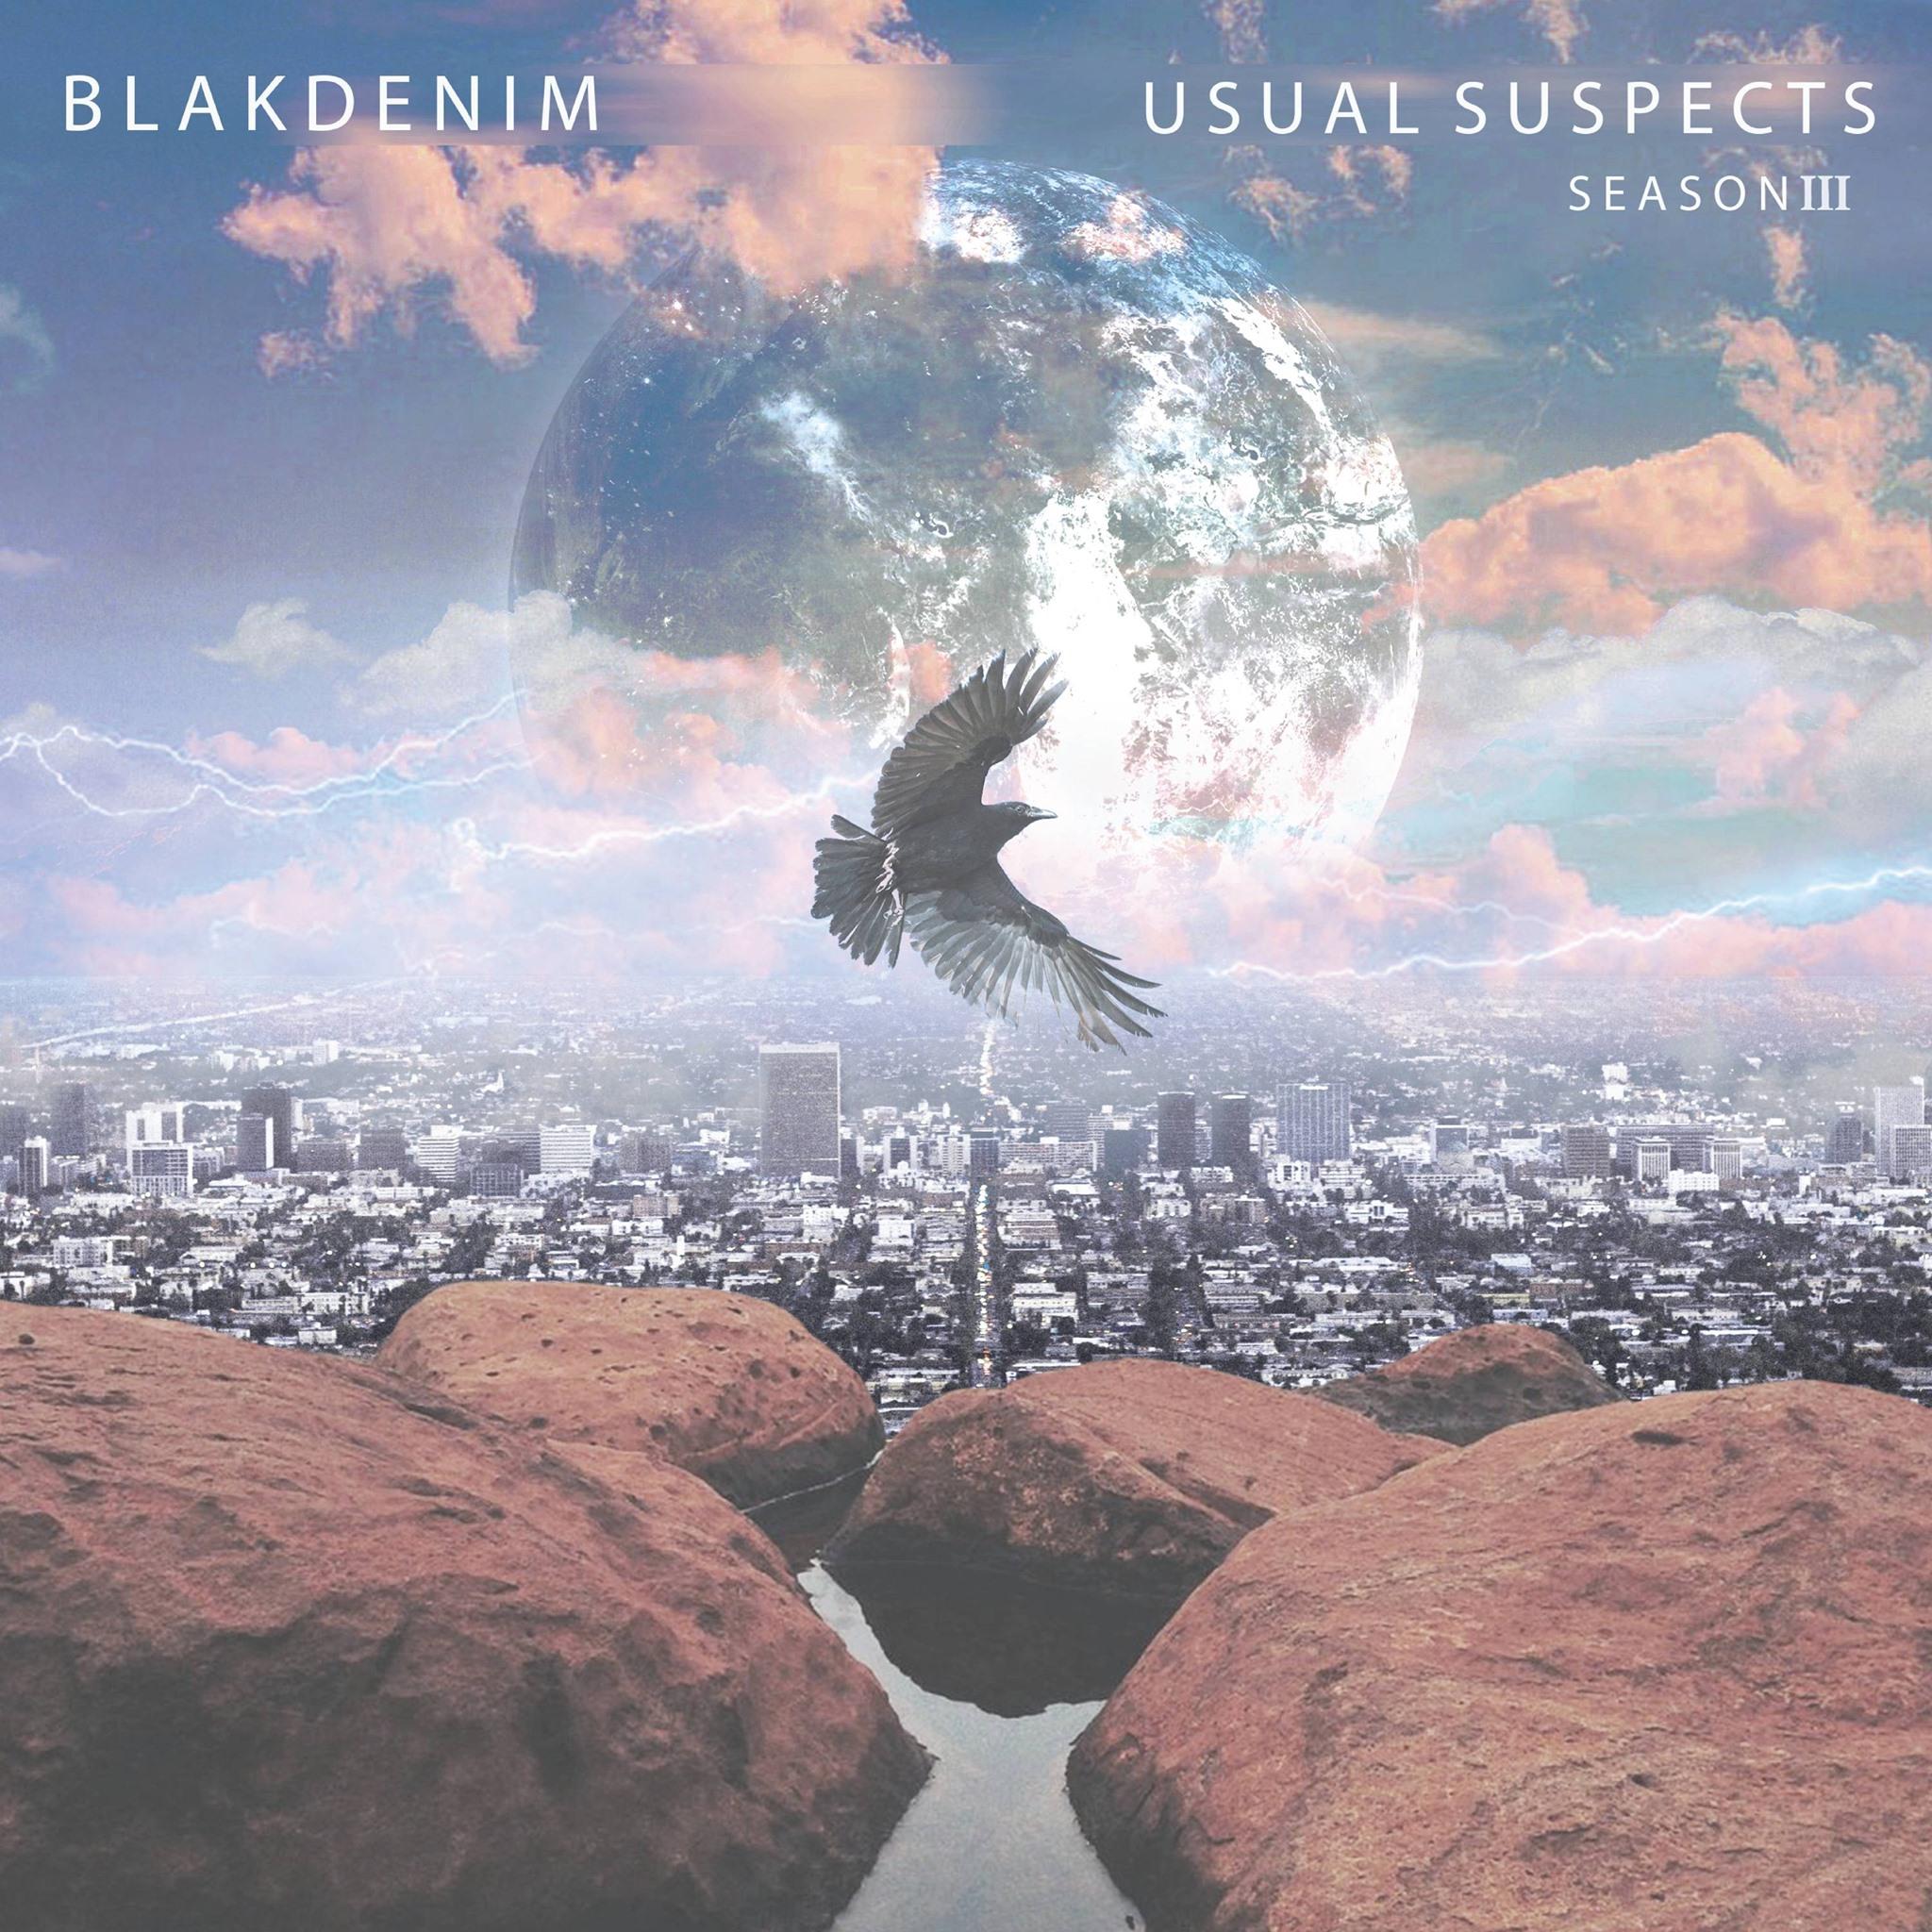 BLAKDENIM - Usual Suspects Season III